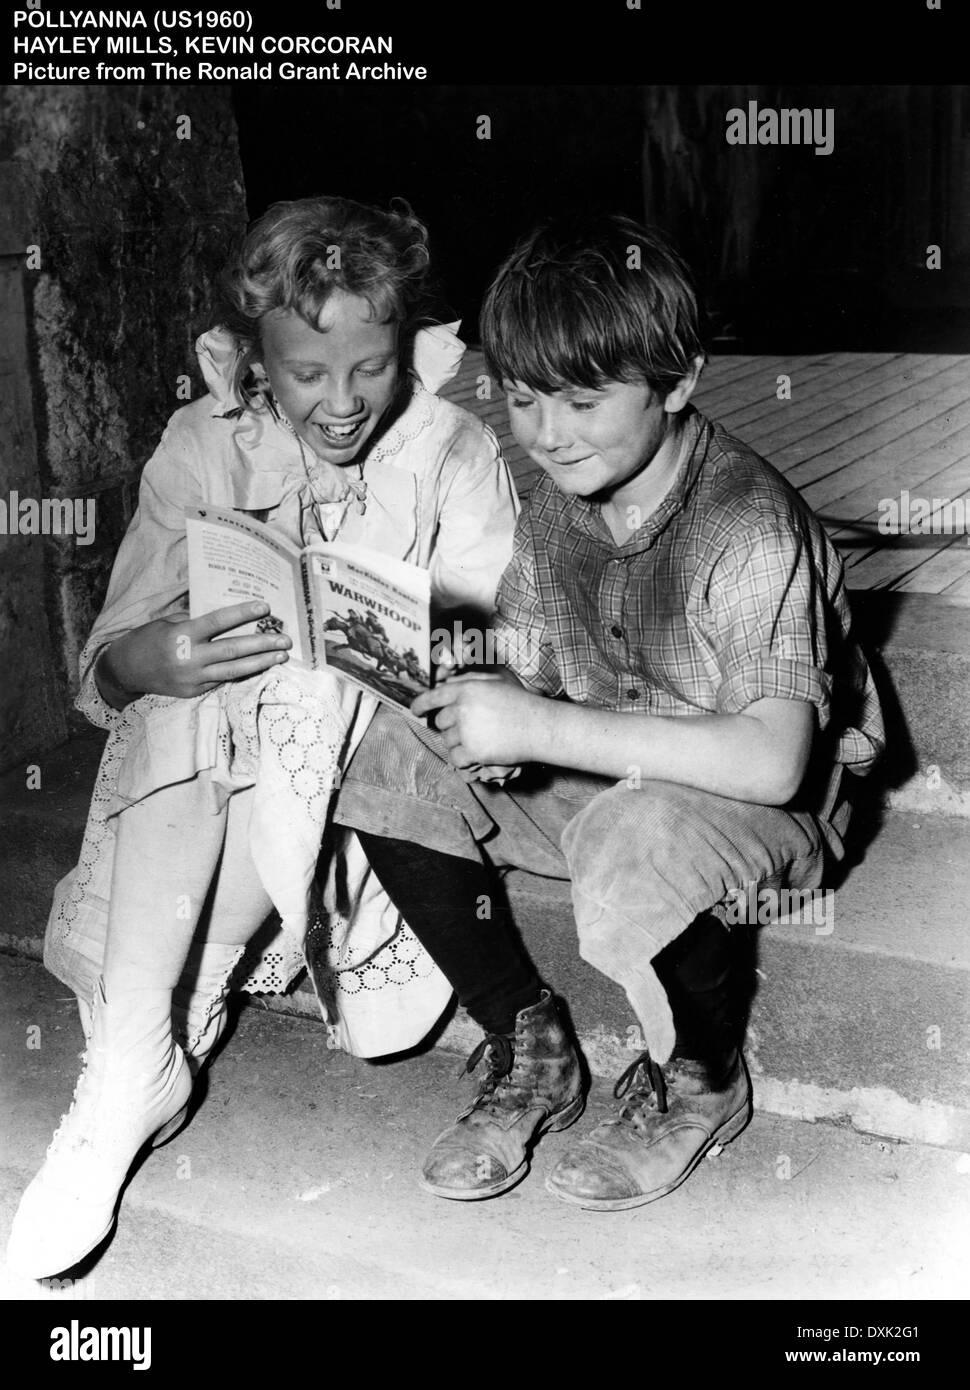 POLLYANNA (BR1960) HAYLEY MILLS, KEVIN CORCORAN  READING: BO - Stock Image